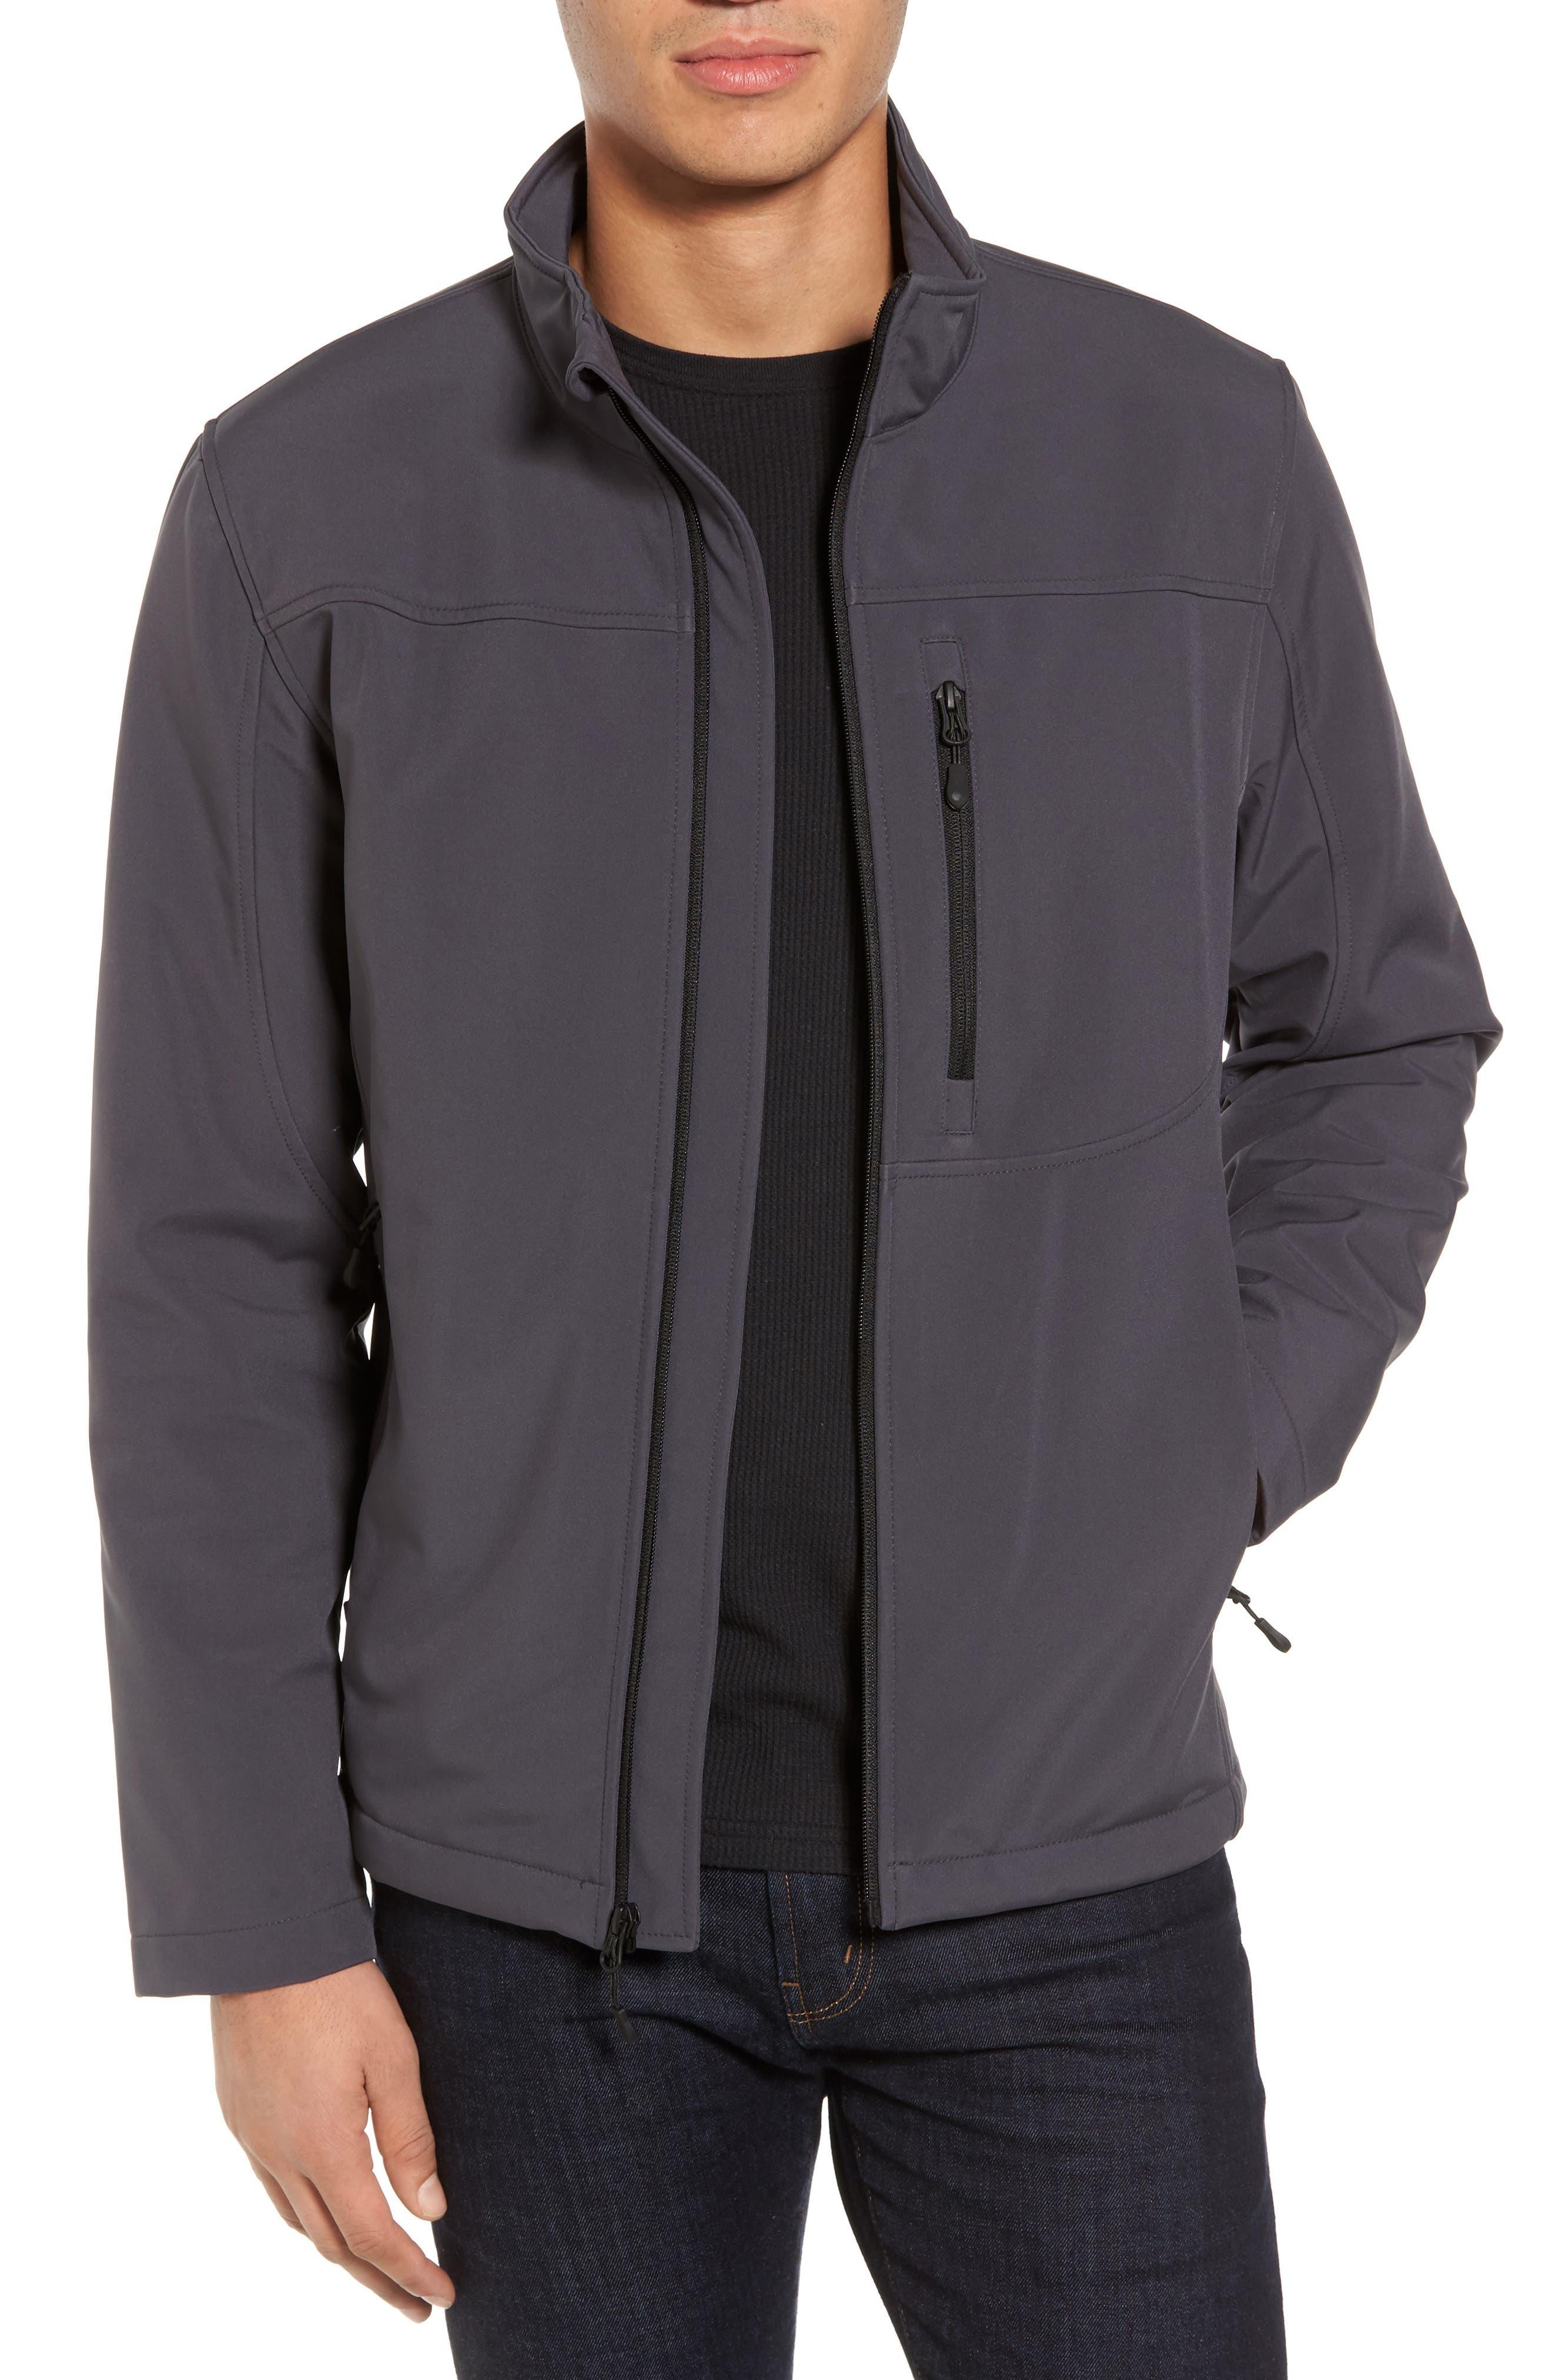 Black Rivet Soft Shell Jacket